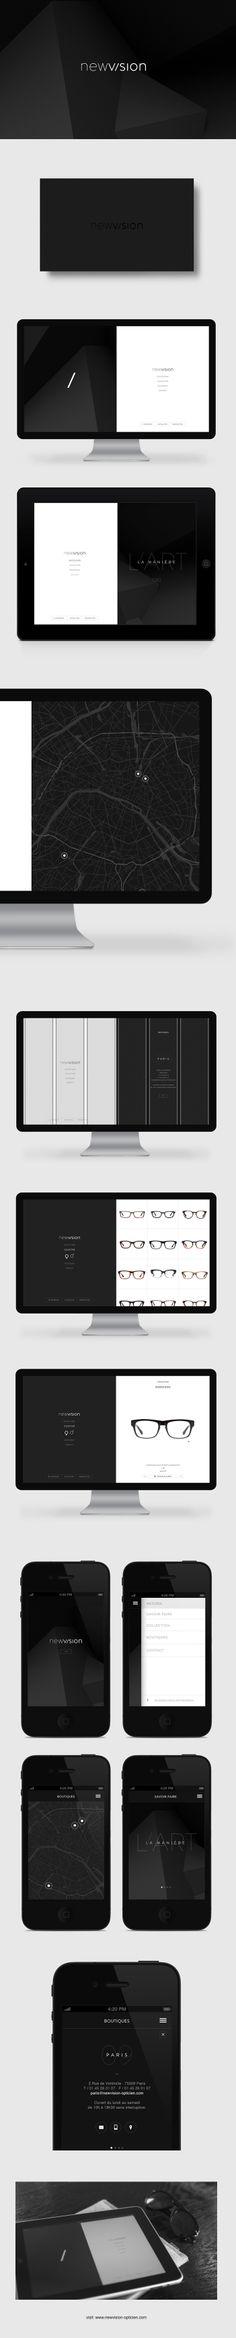 #interactive #UI #UX #IxD #design #interface #animation #mobile #motion #tablet #screen #experience #HUD #digital #technology #development #future #experimental #app #widget #web #website #layout